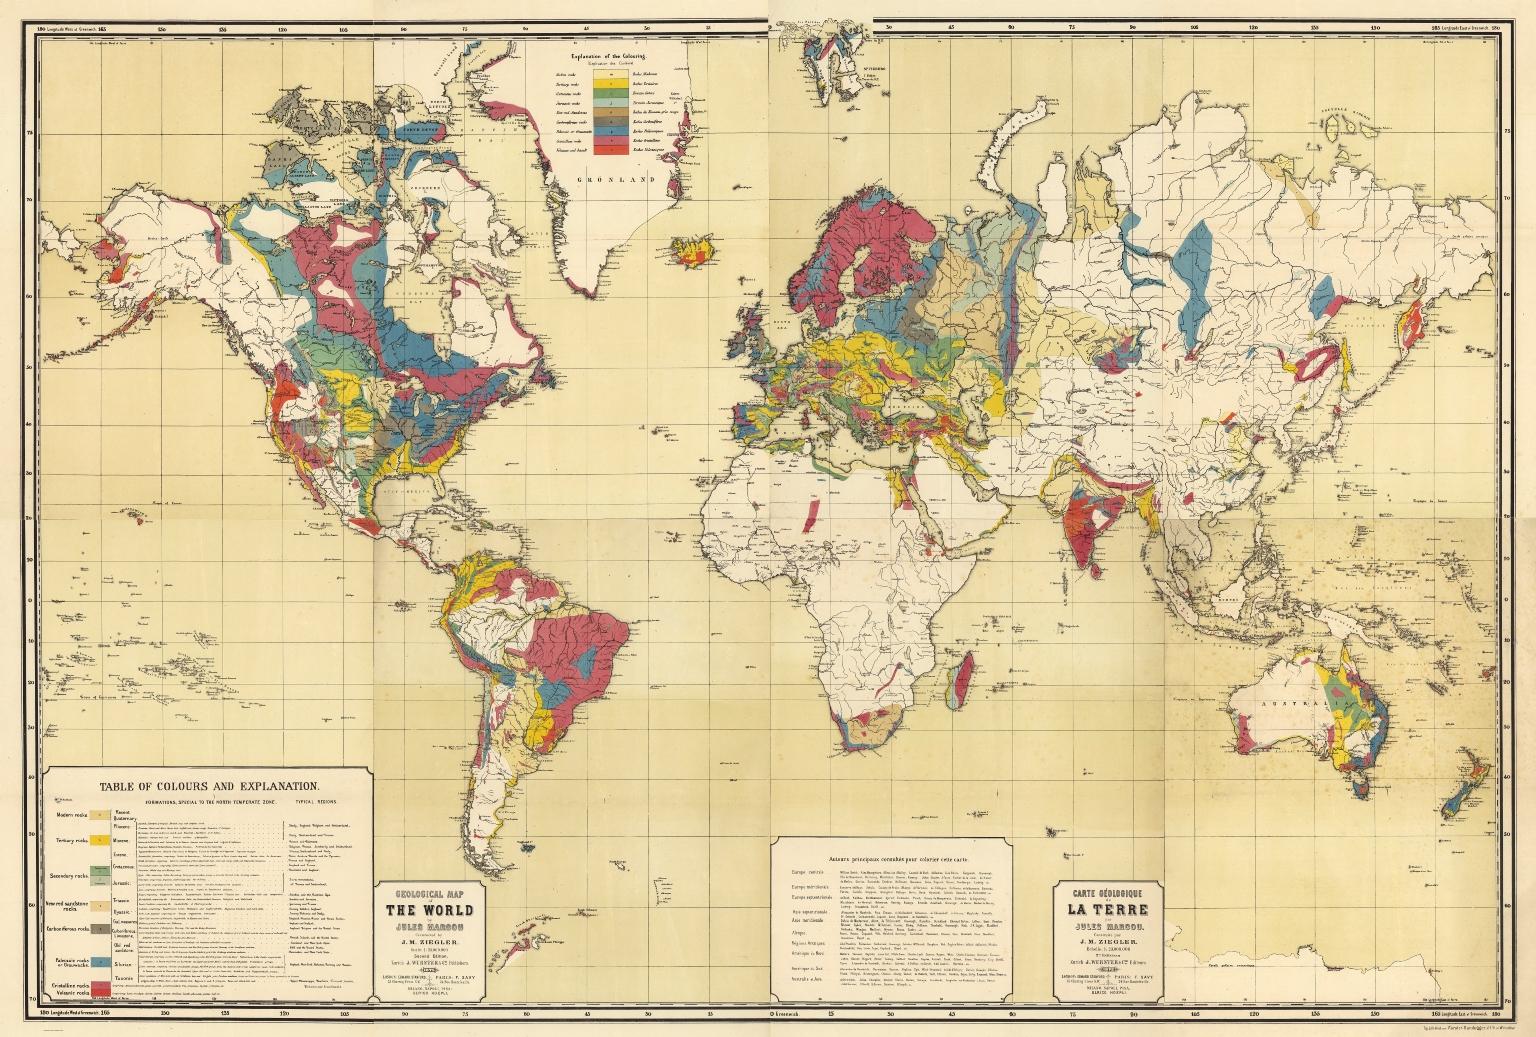 Composite map: Geological map of the world. Carte geologique de la